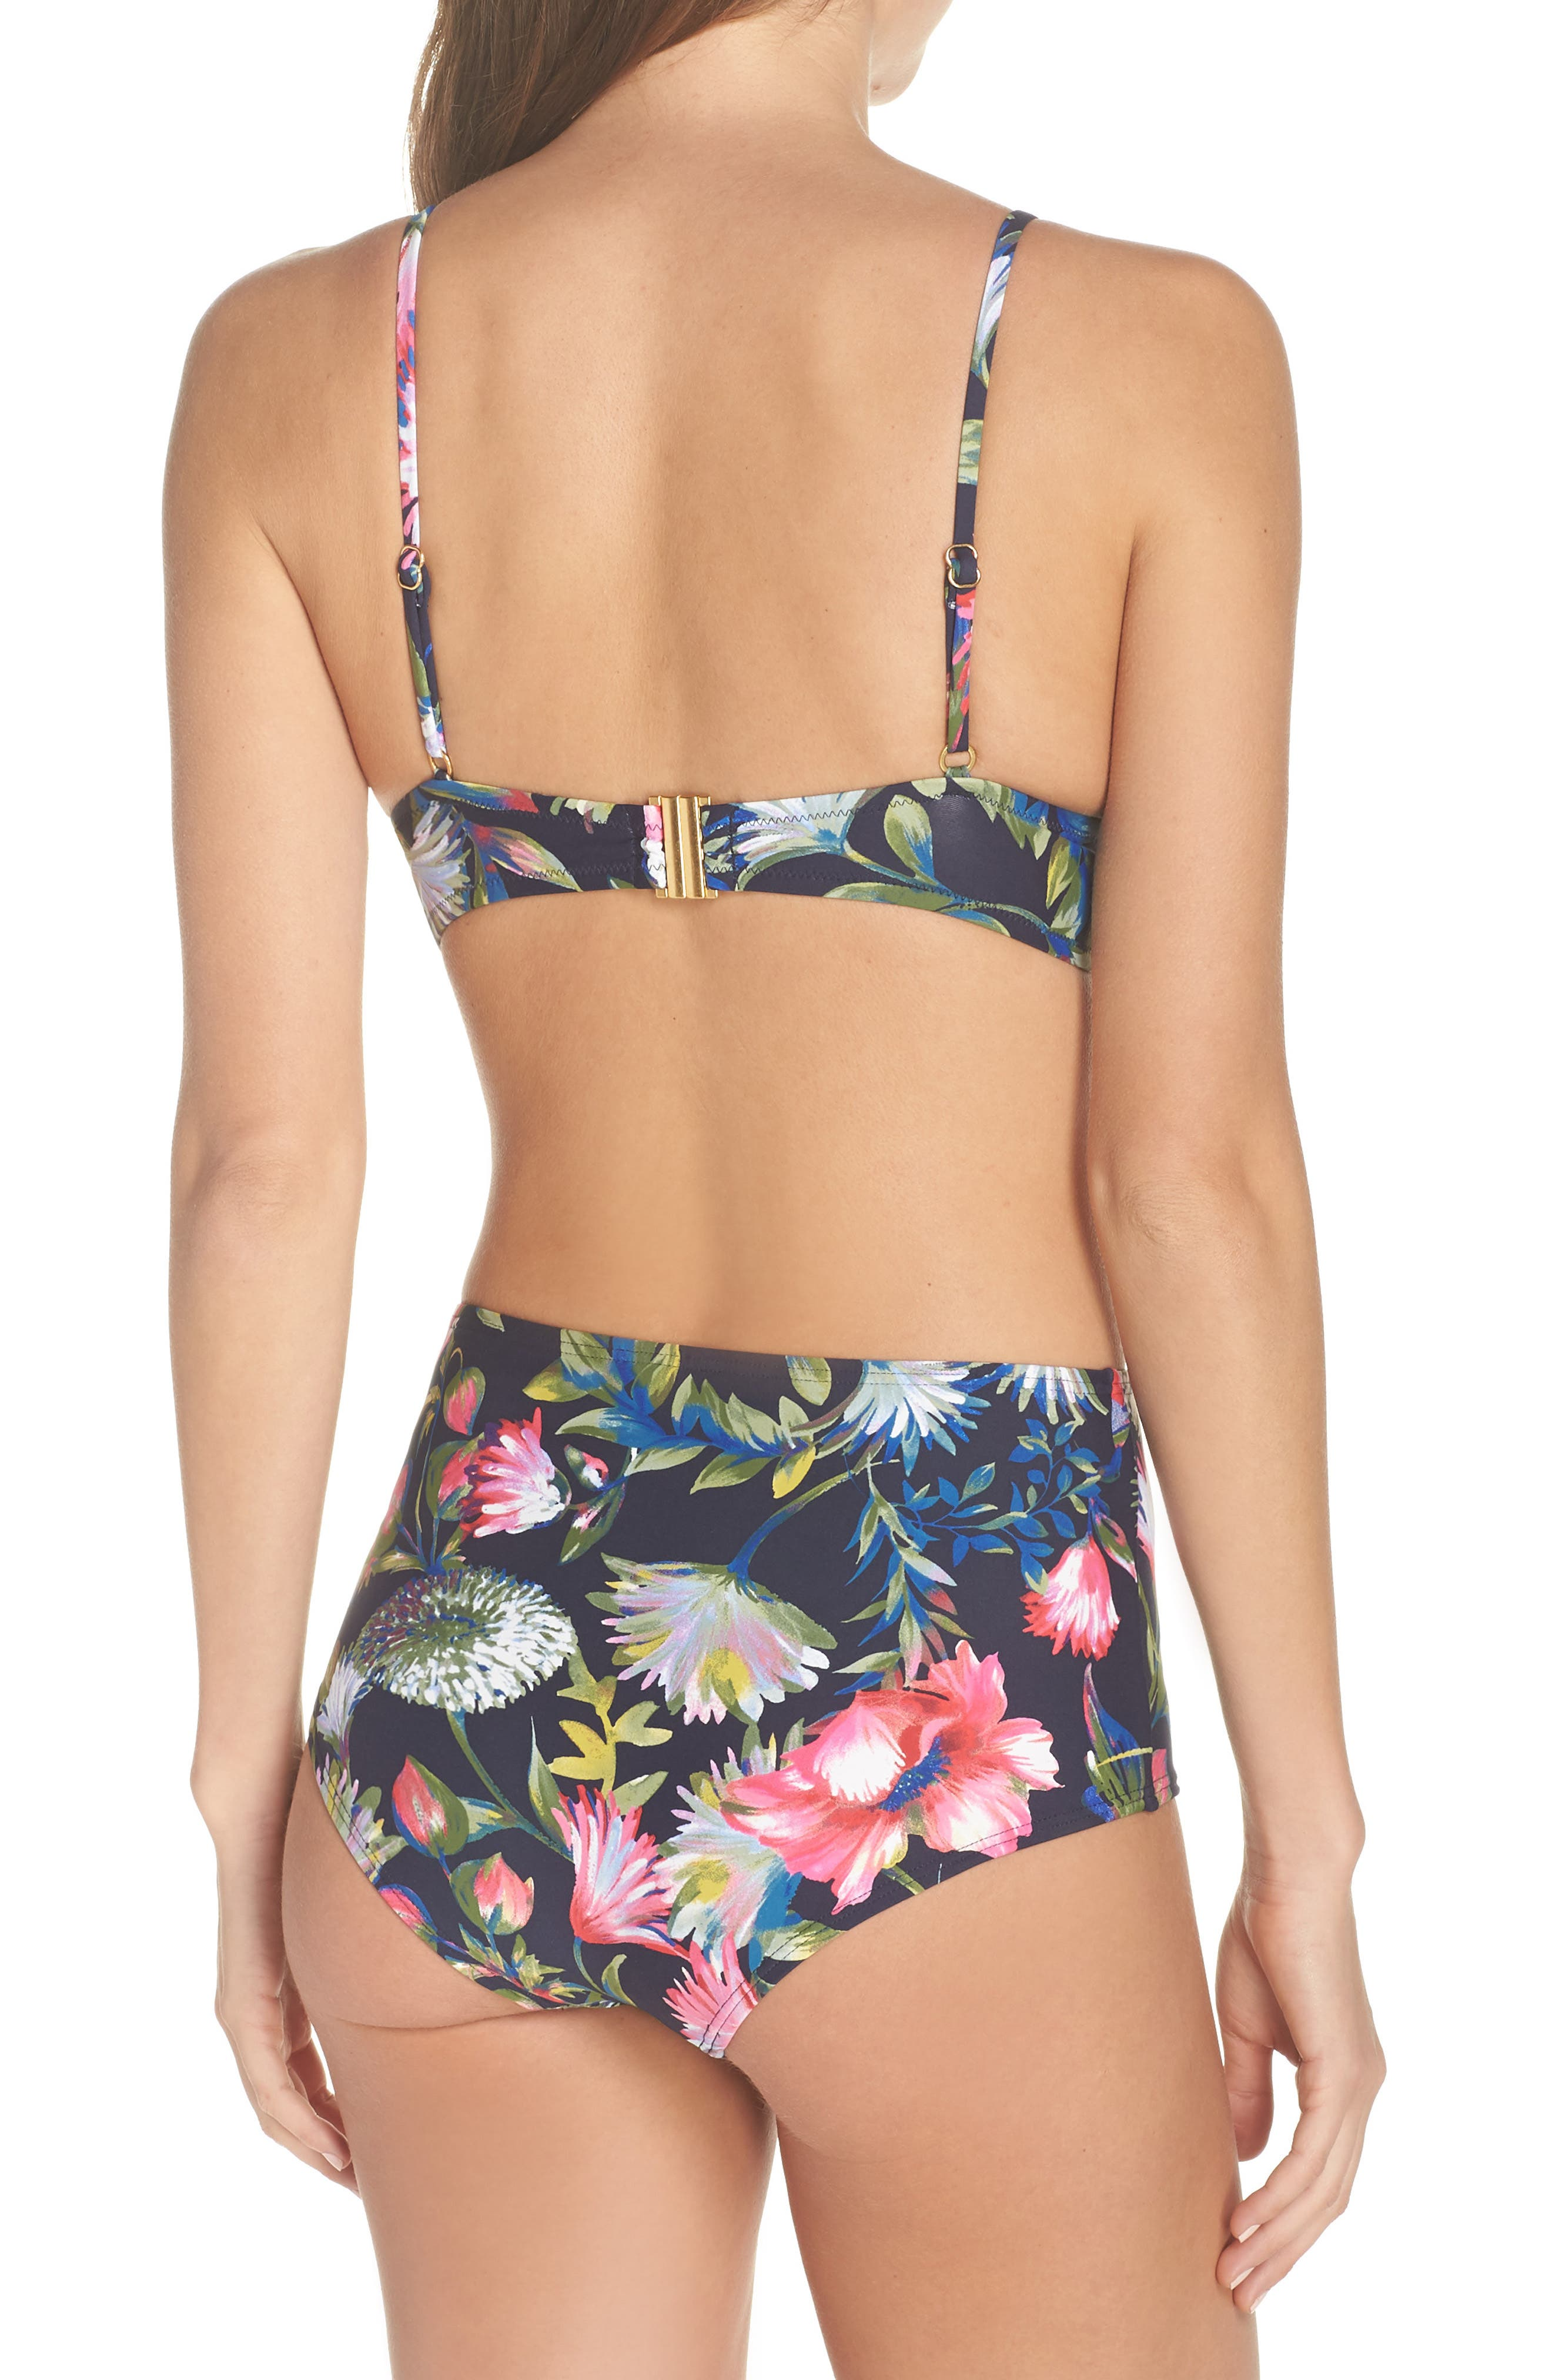 Floral Seamless High Waist Bikini Bottoms,                             Alternate thumbnail 8, color,                             NAVY